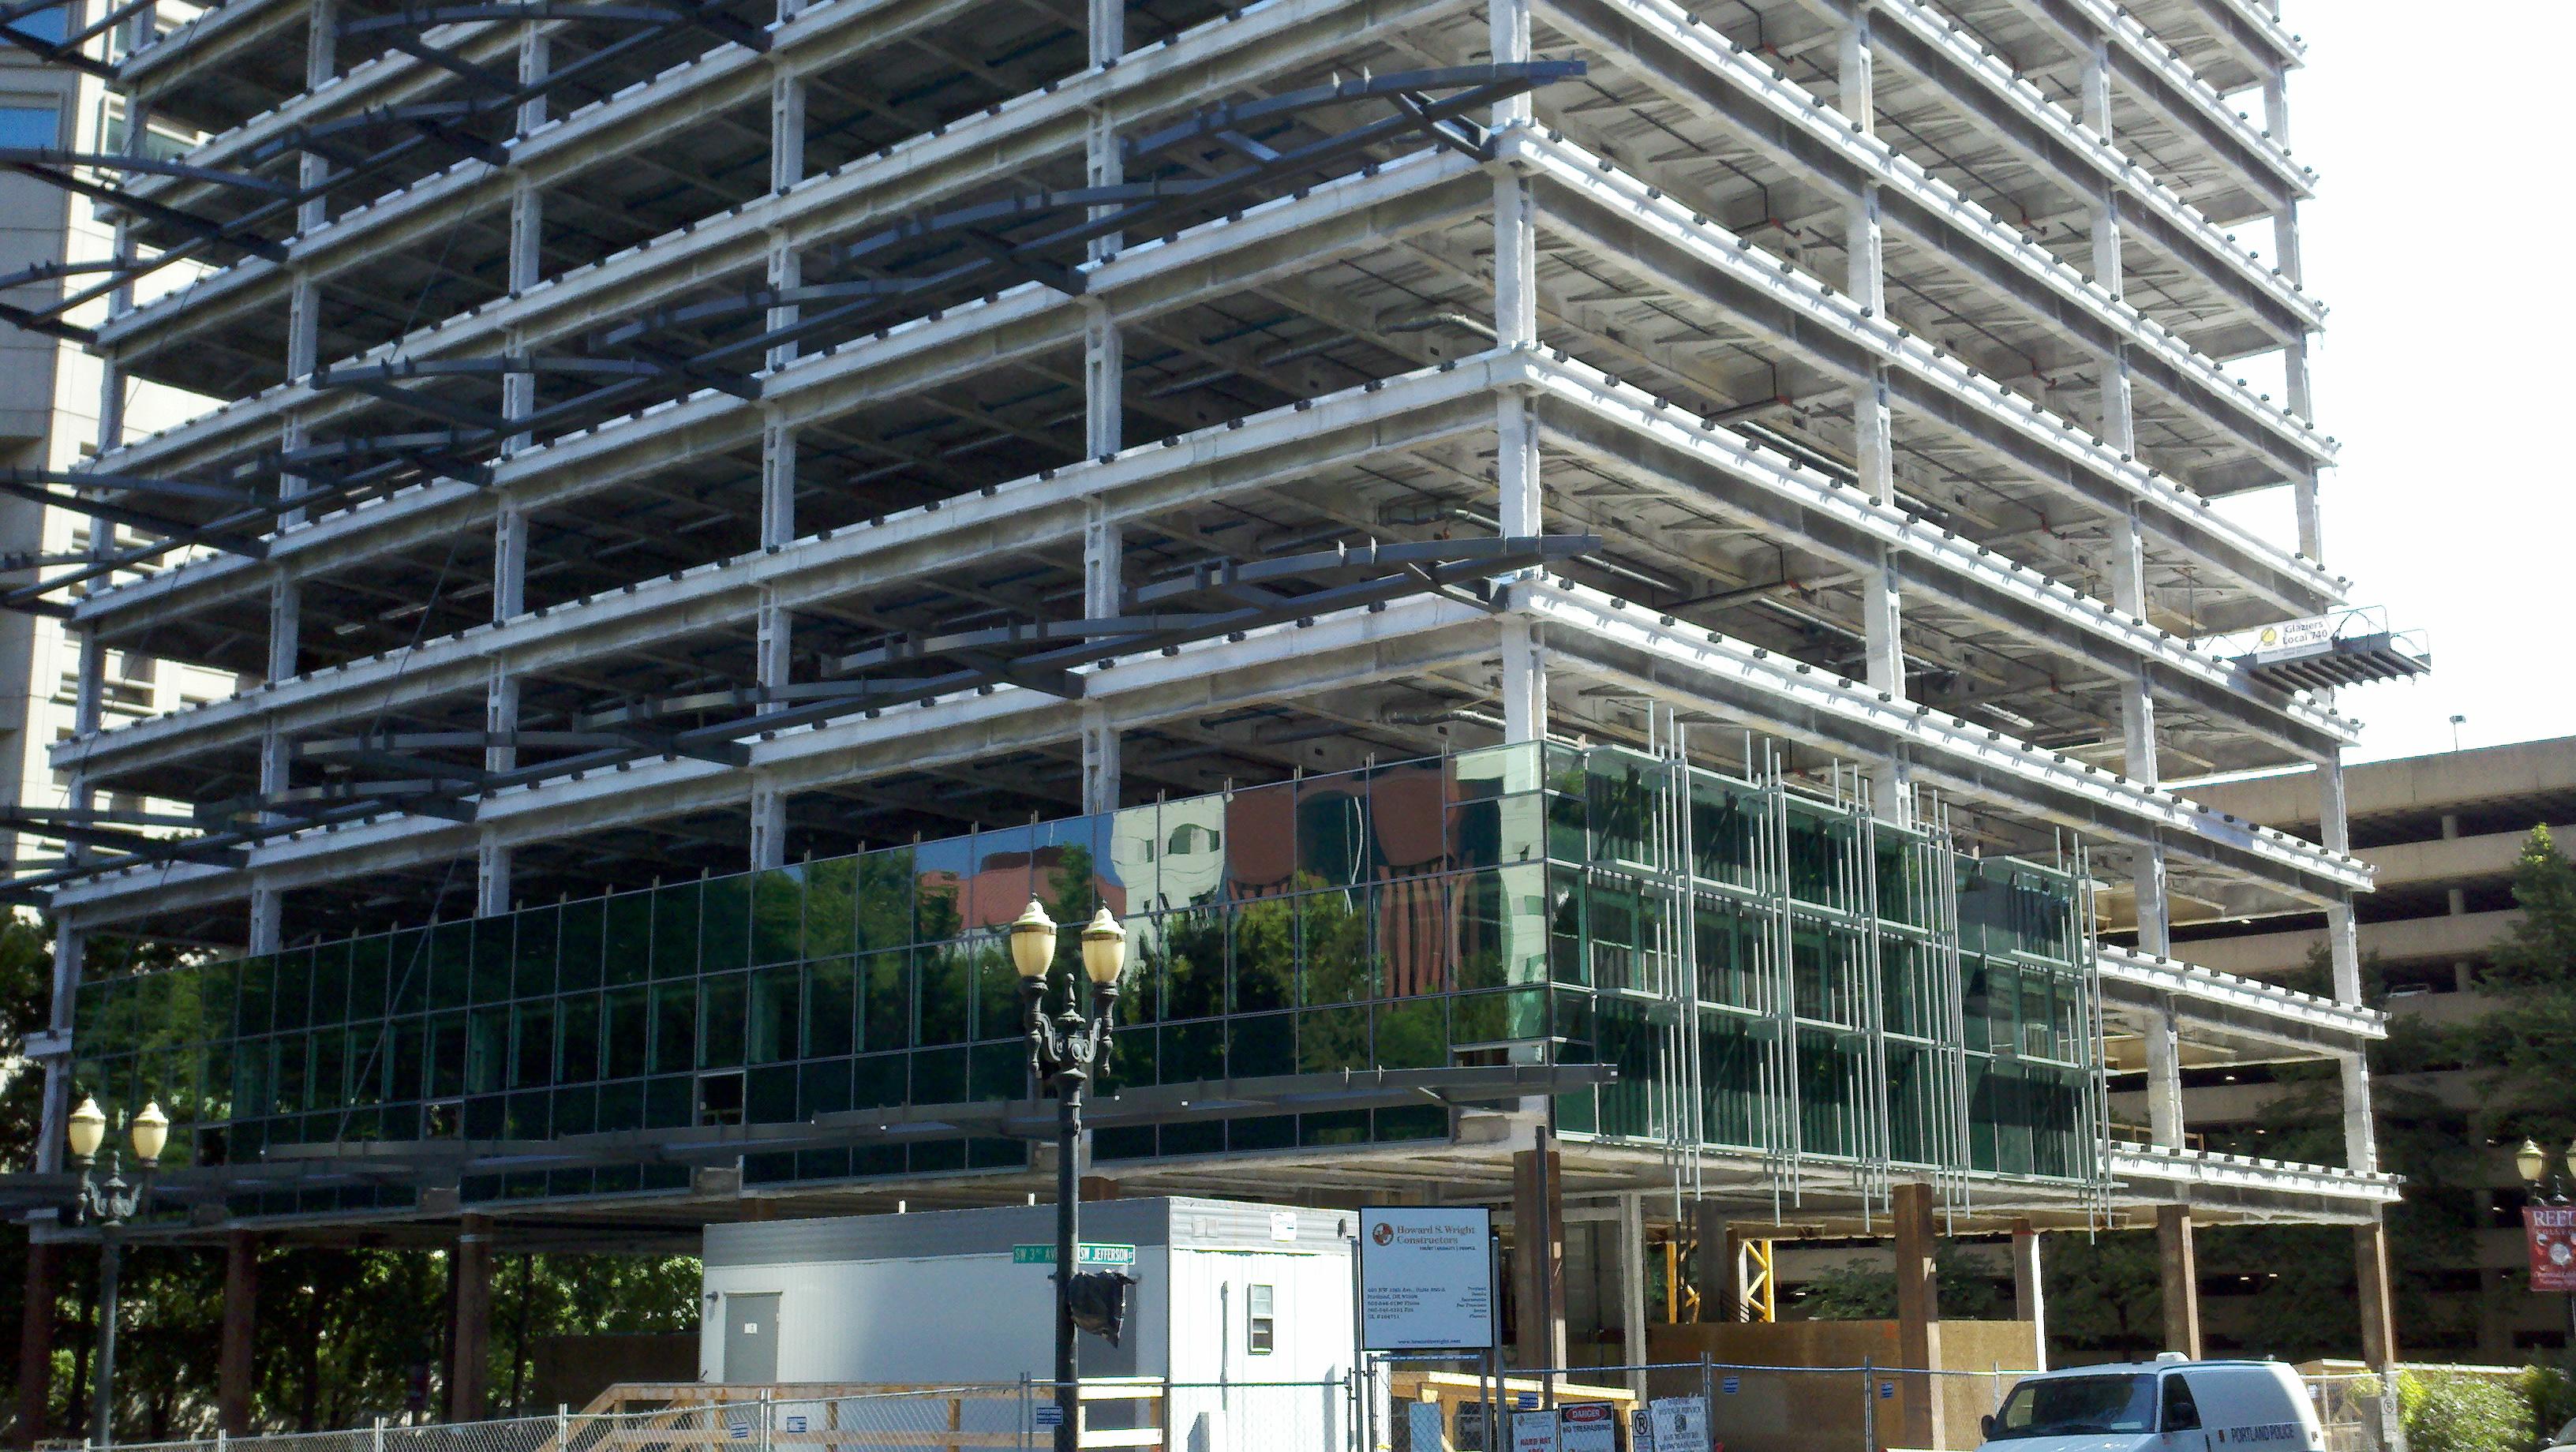 file green wyattfederal building under remodel bottom portland